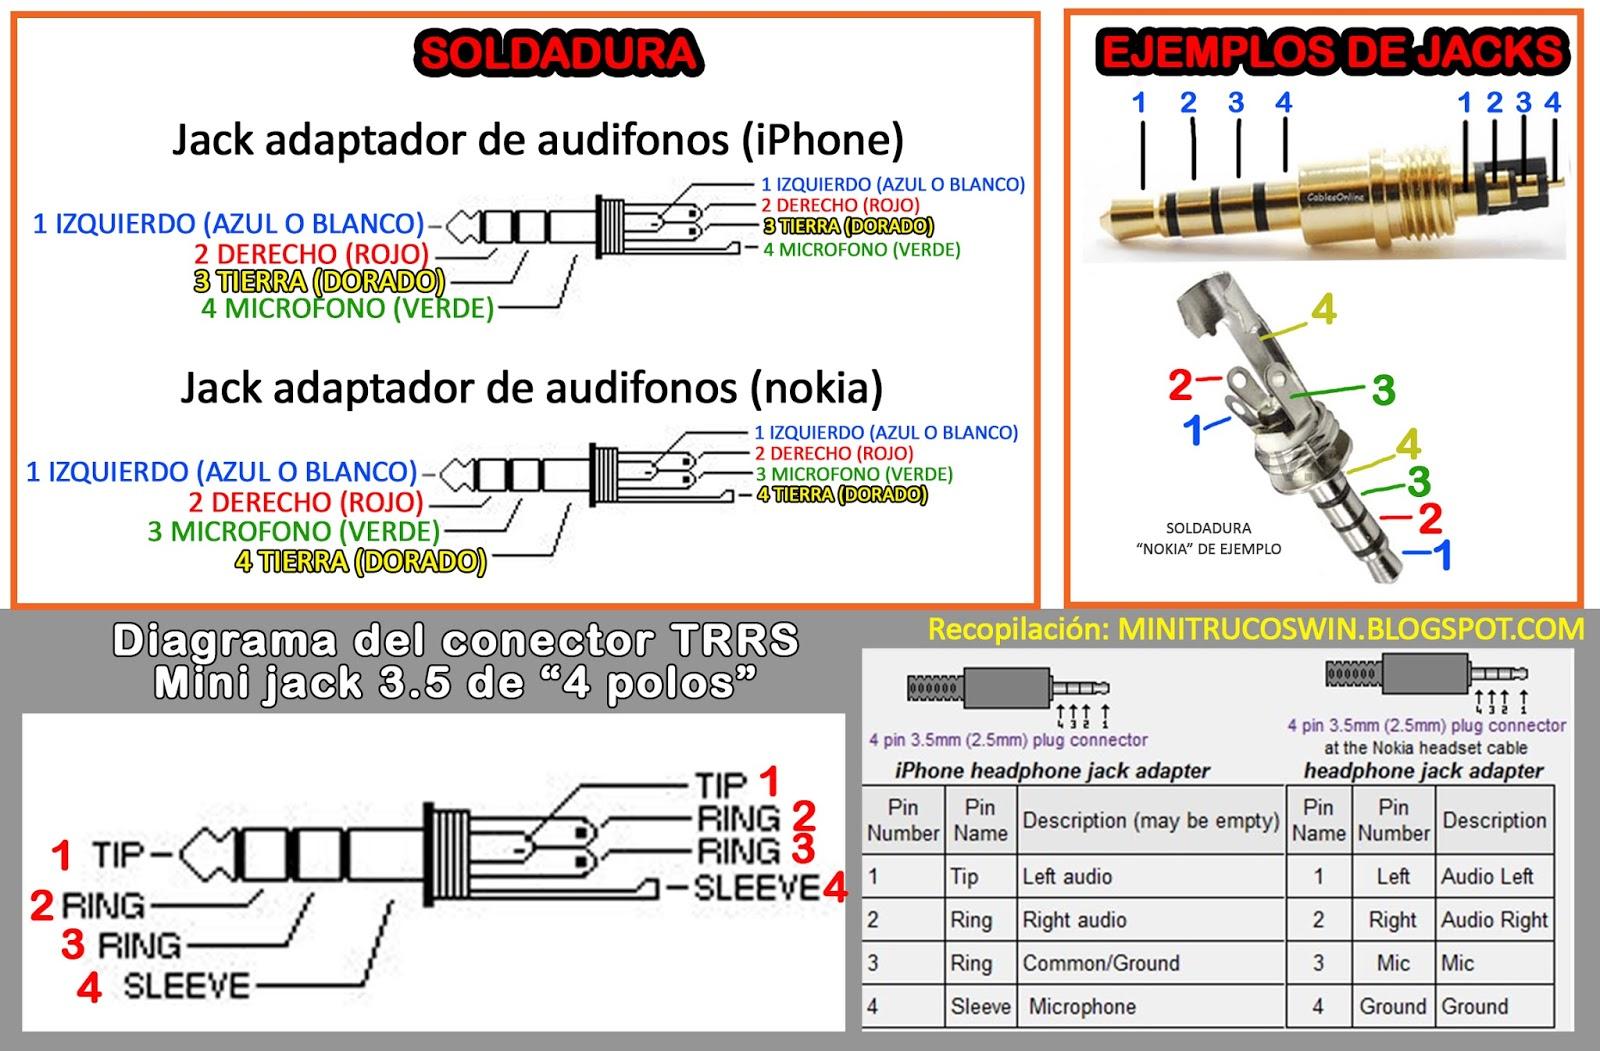 Trrs To Trs Wiring Diagram Msd Digital 6al Minitrucoswin Como Reparar Audifonos Cambiar Mini